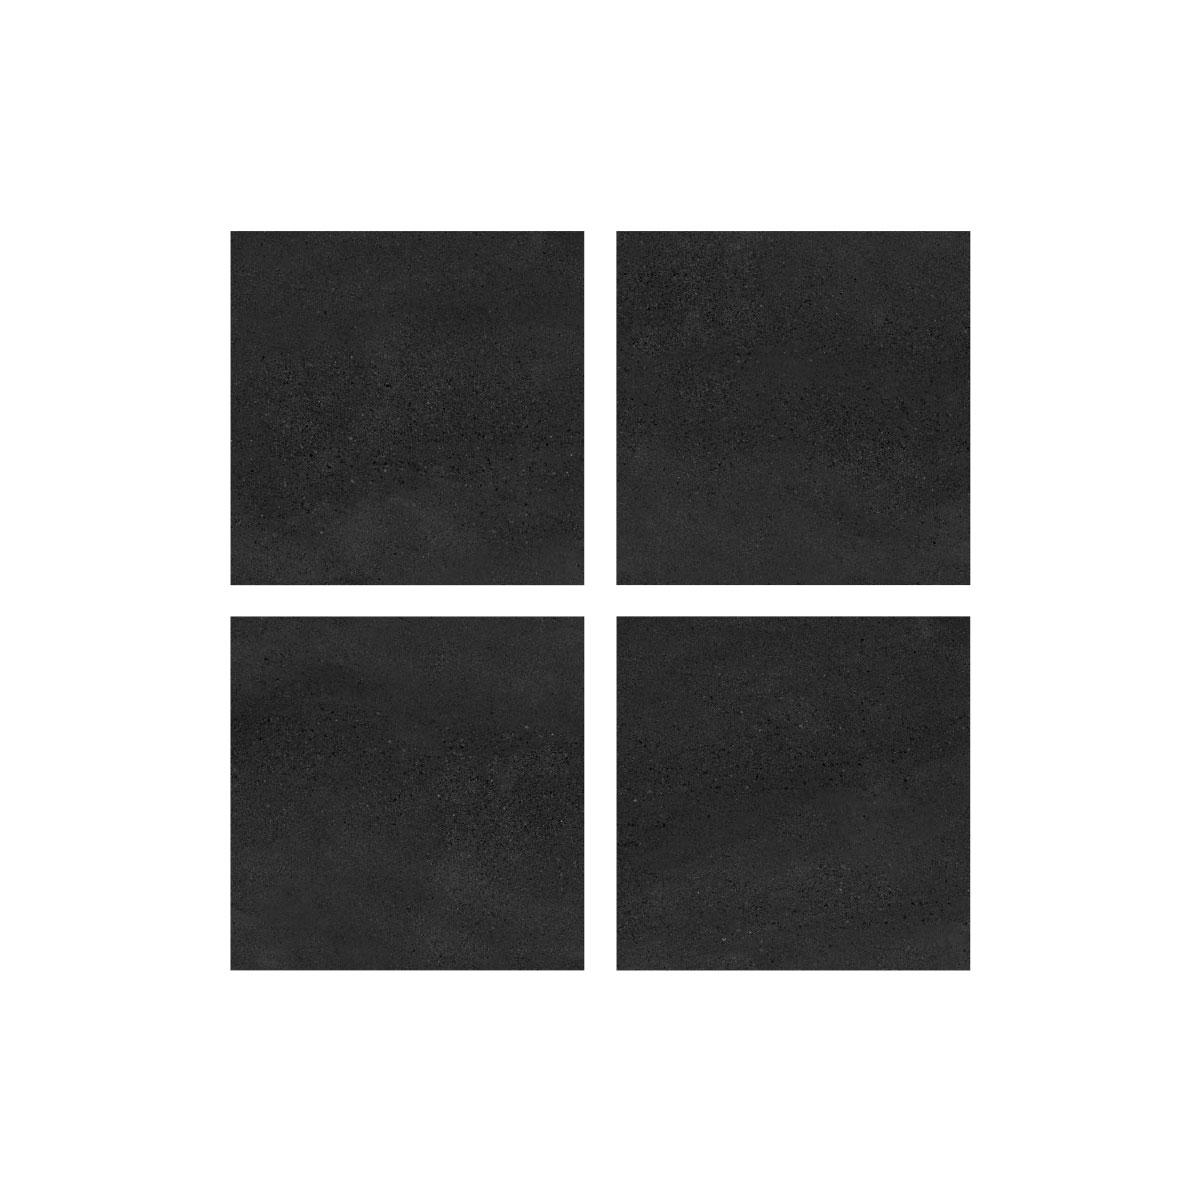 Moonstone - Midnight - Concrete Look Tiles - 600x600mm - Stone3